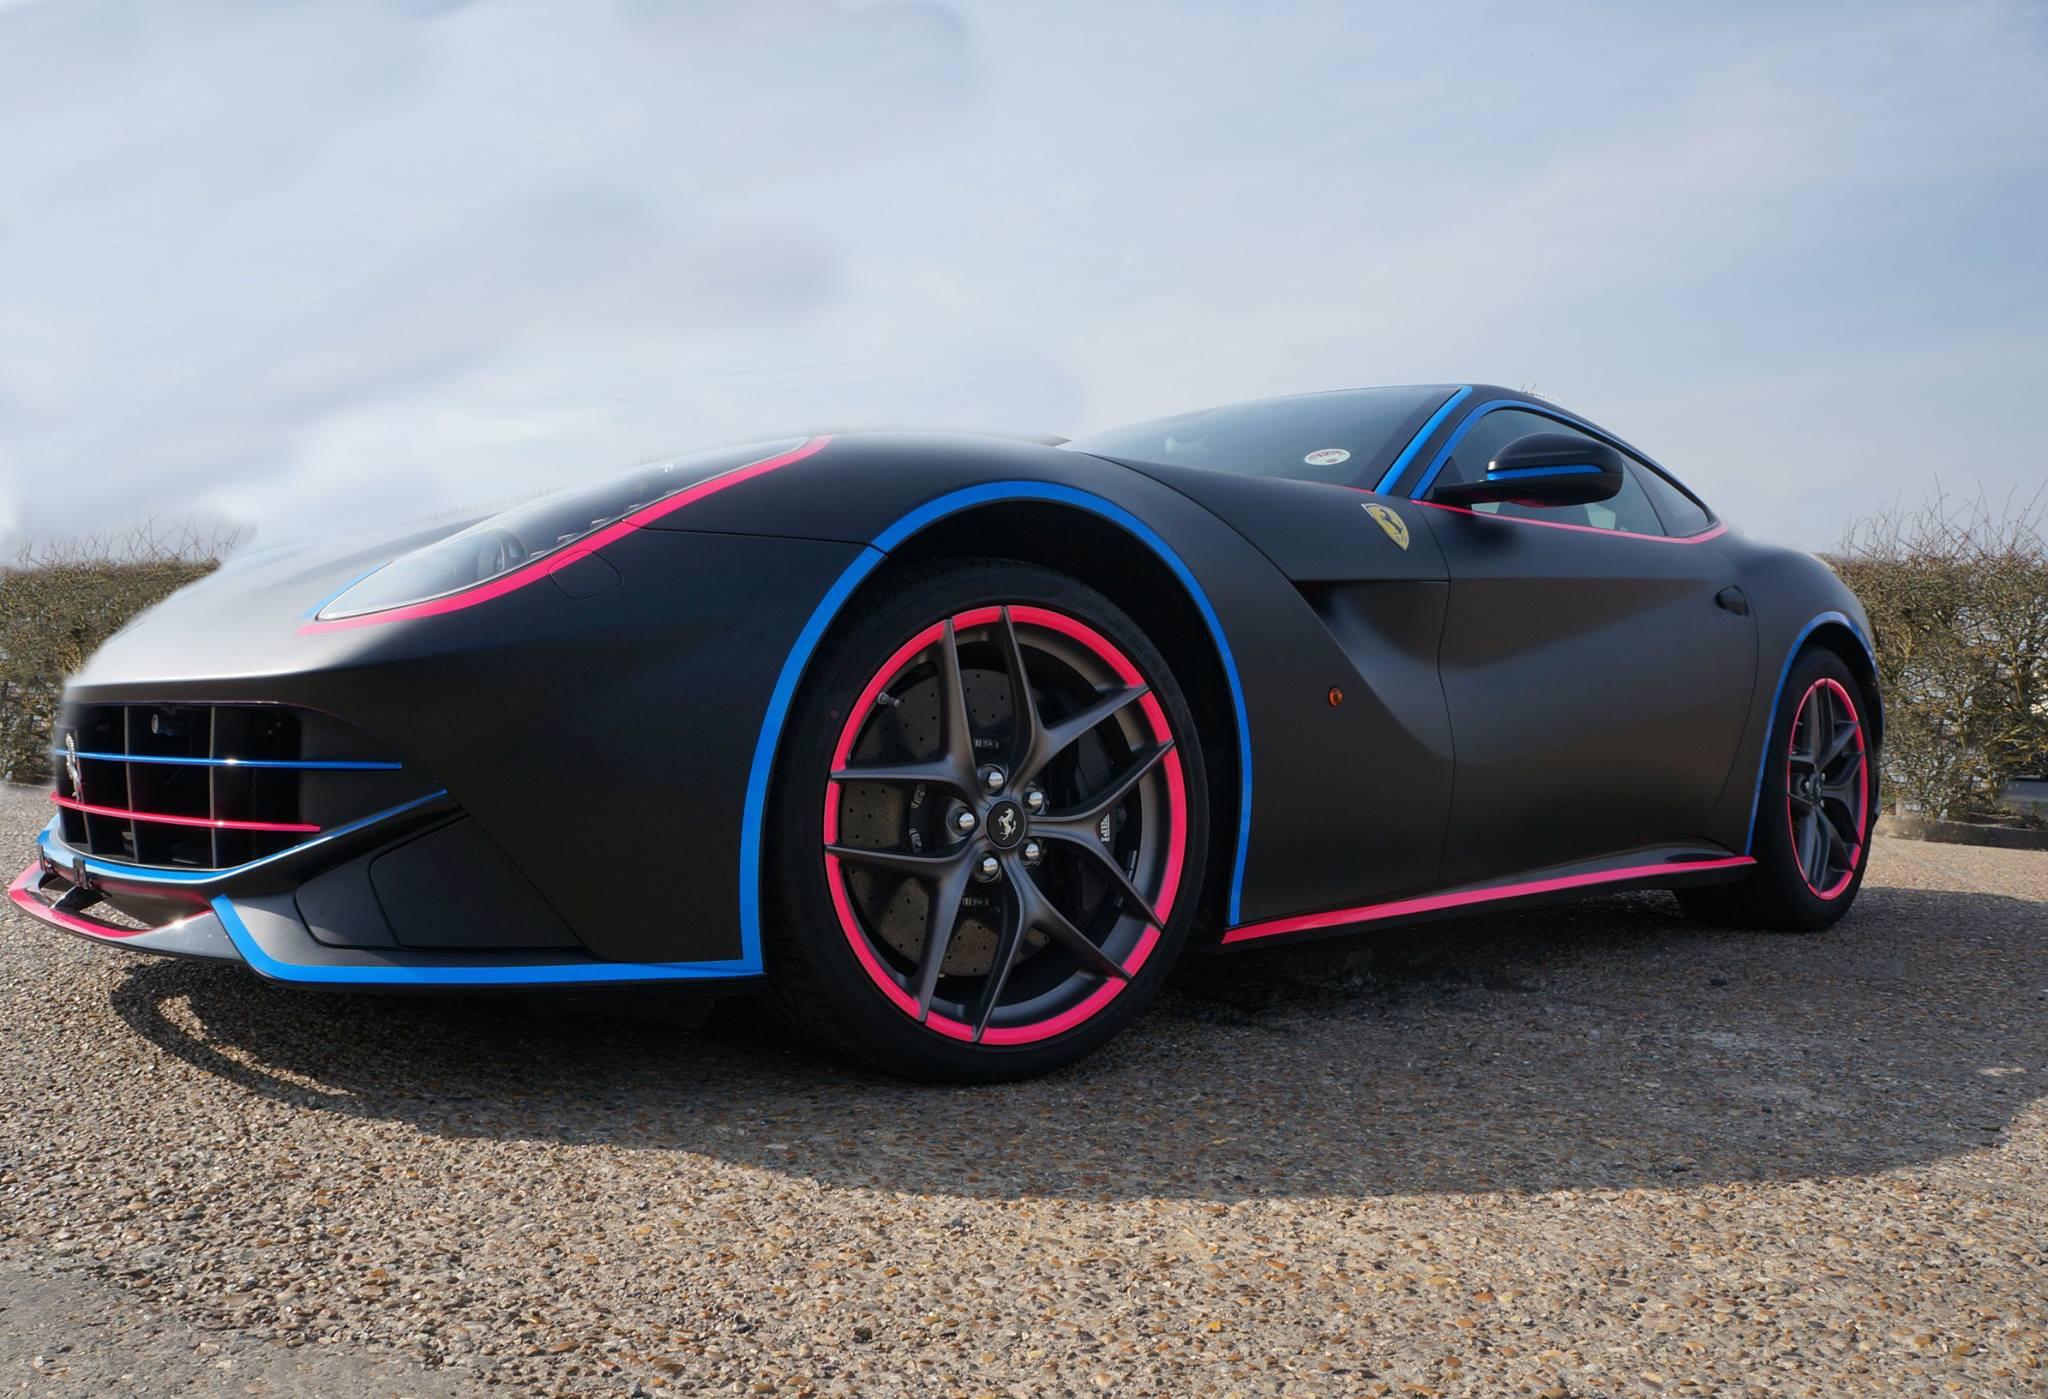 2014 Gumball 3000 Rally Wrap: Ferrari F12 Gets Miami Vice Look - autoevolution